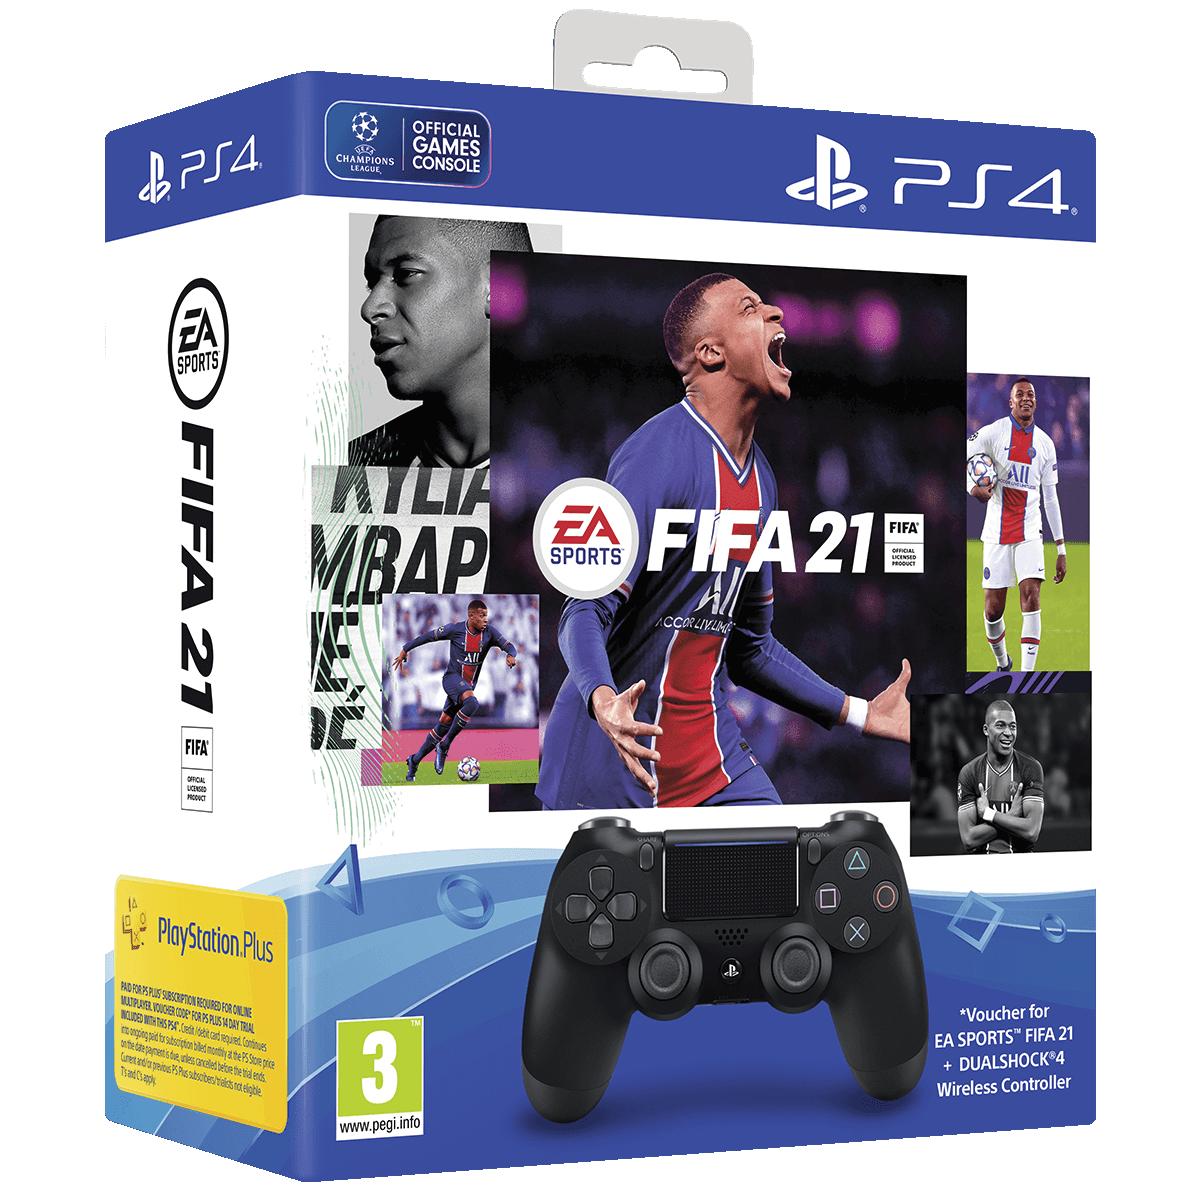 FIFA 21 DS4 – slika kompleta